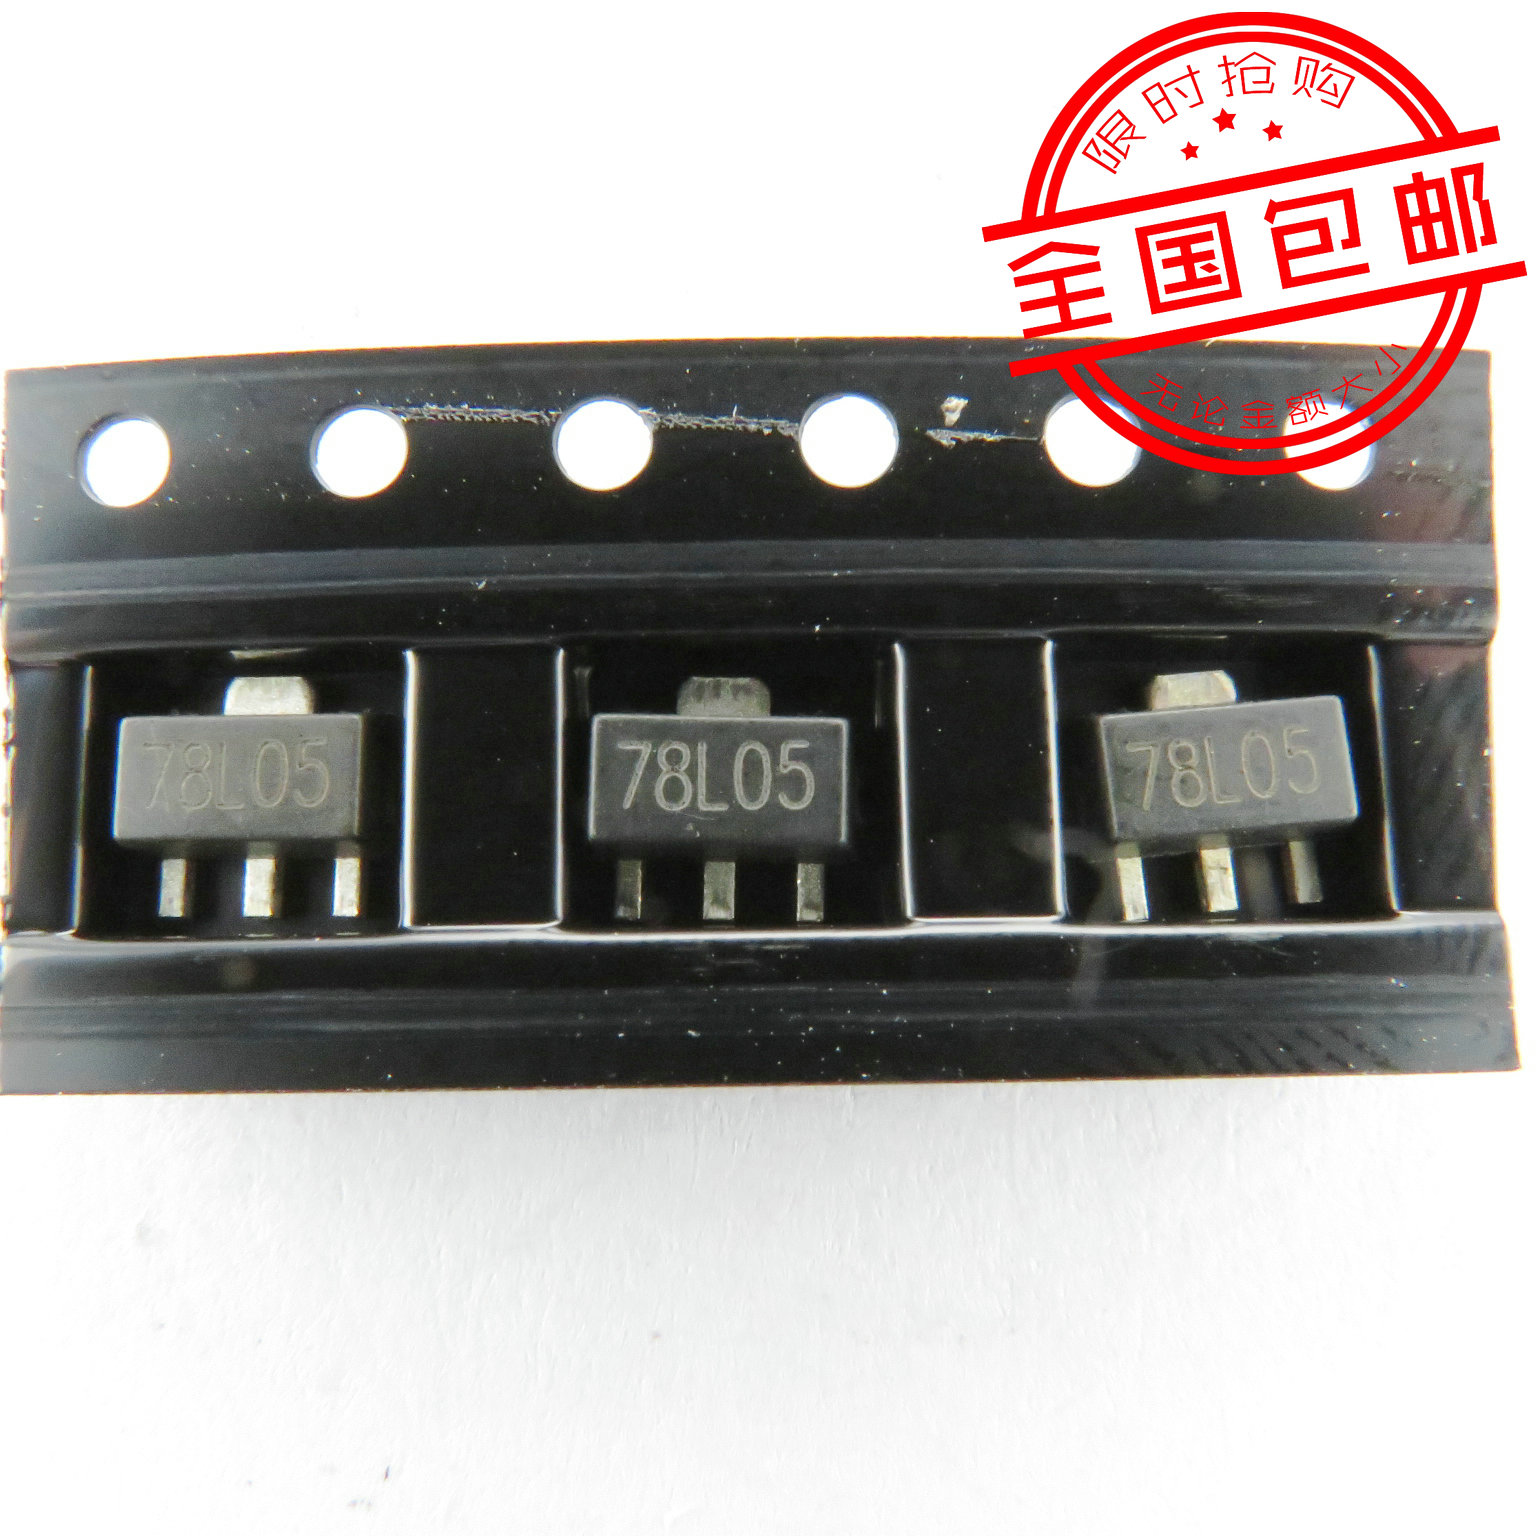 Транзистор  Патч транзистор 5В 78l05 три терминала регулятора напряжения сот-89(100 $ 15)